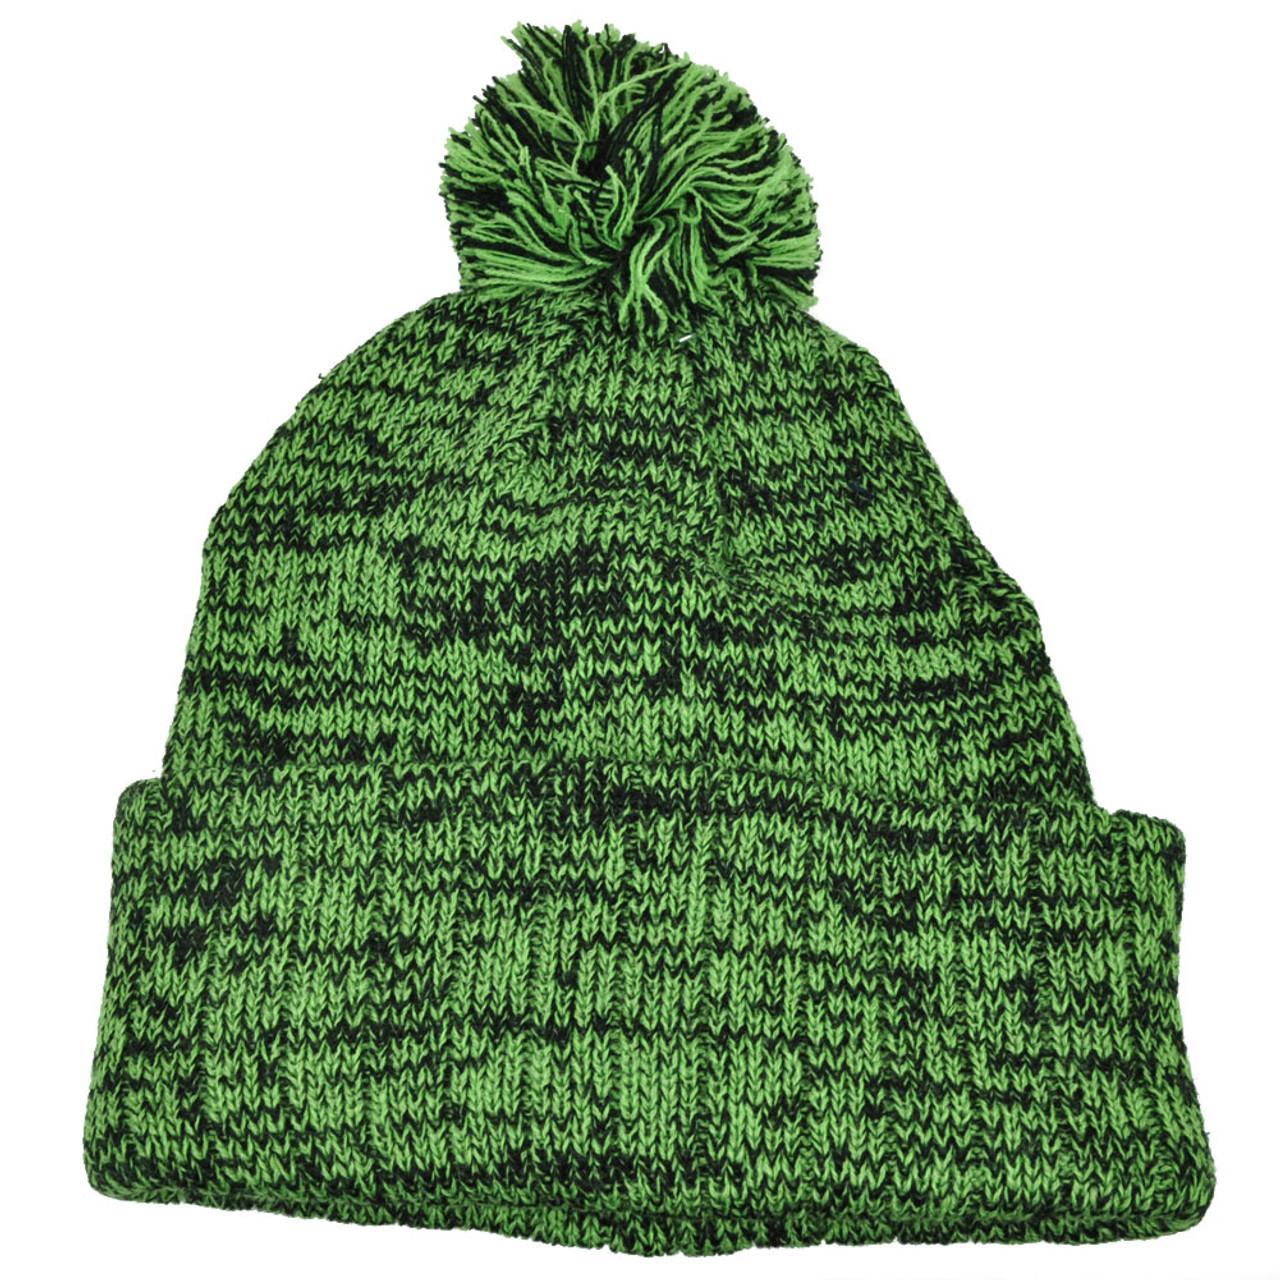 cb439ab569be3 Heather Green Blank Solid Plain Cuffed Knit Beanie Toque Pom Pom Winter Hat  - Cap Store Online.com